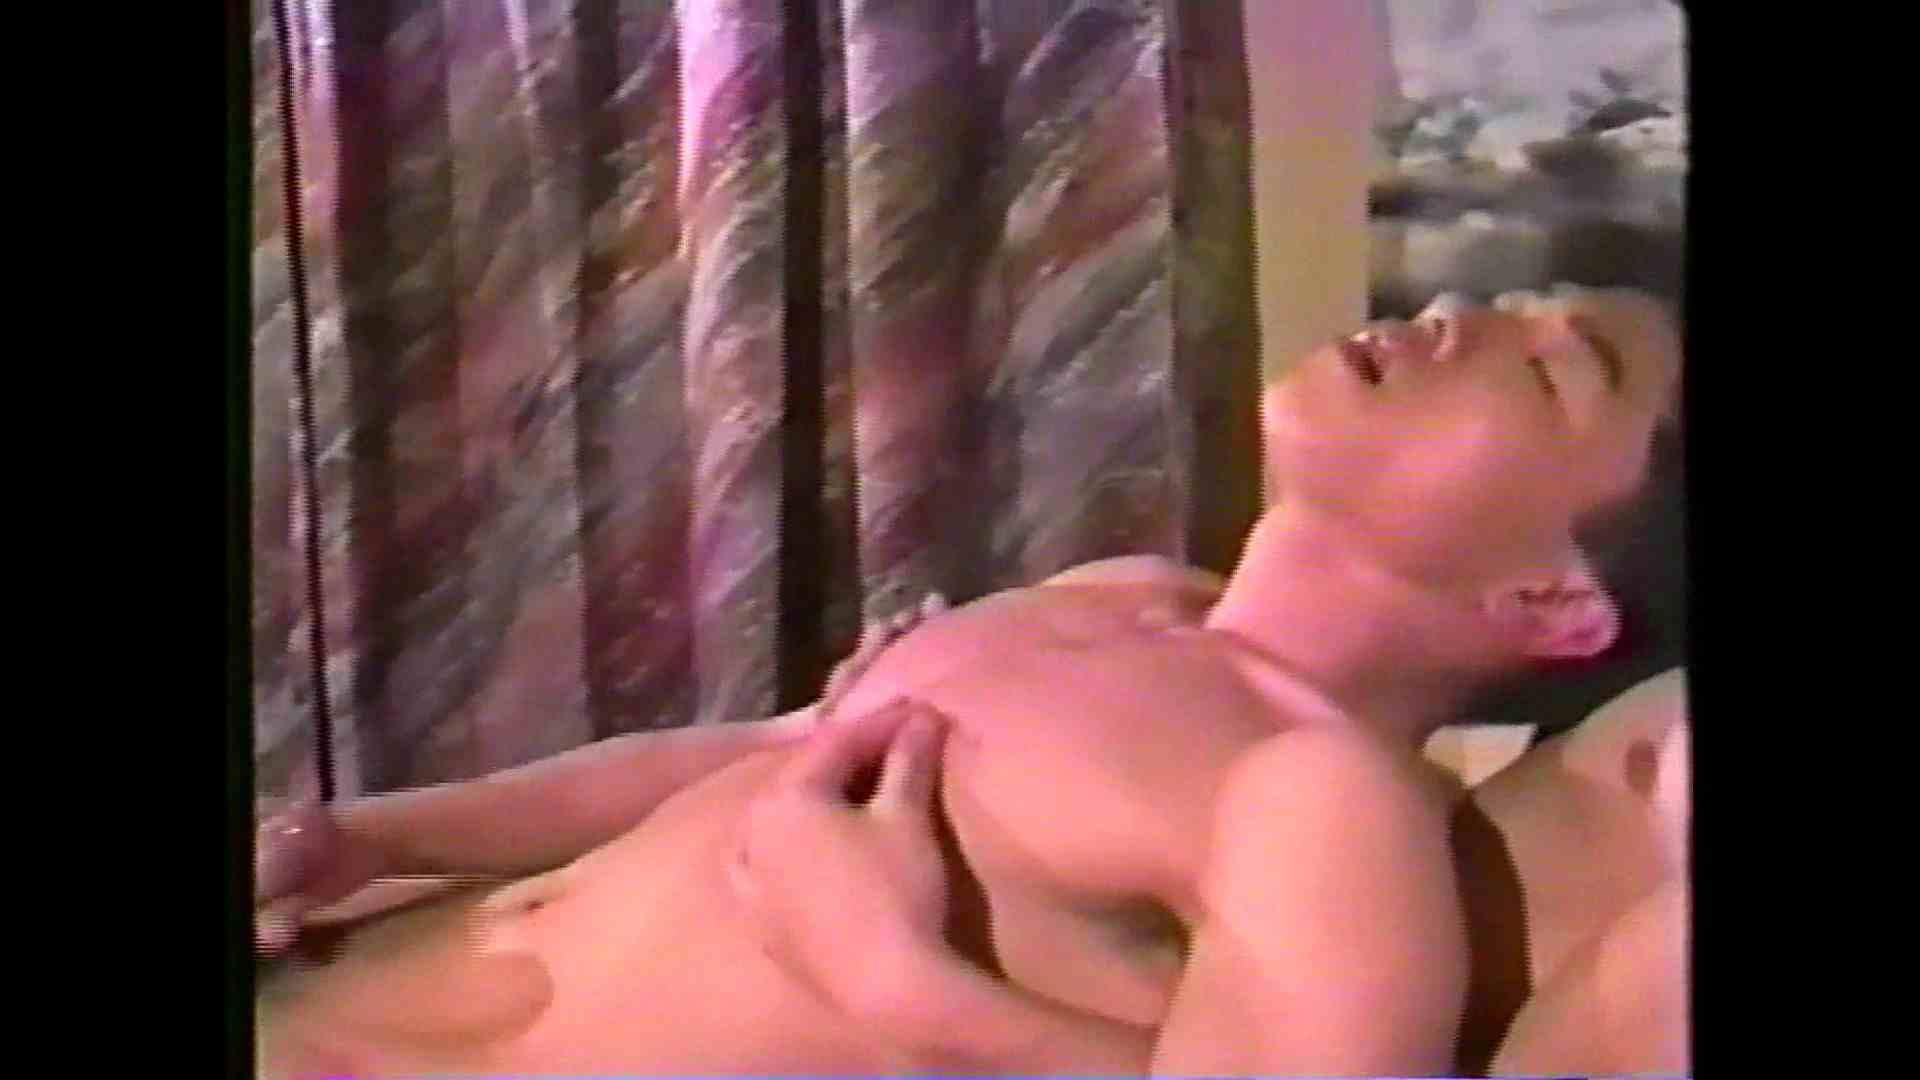 GAYBOY宏のオカズ倉庫Vol.2-2 ゲイのペニス おちんちん画像 81枚 54